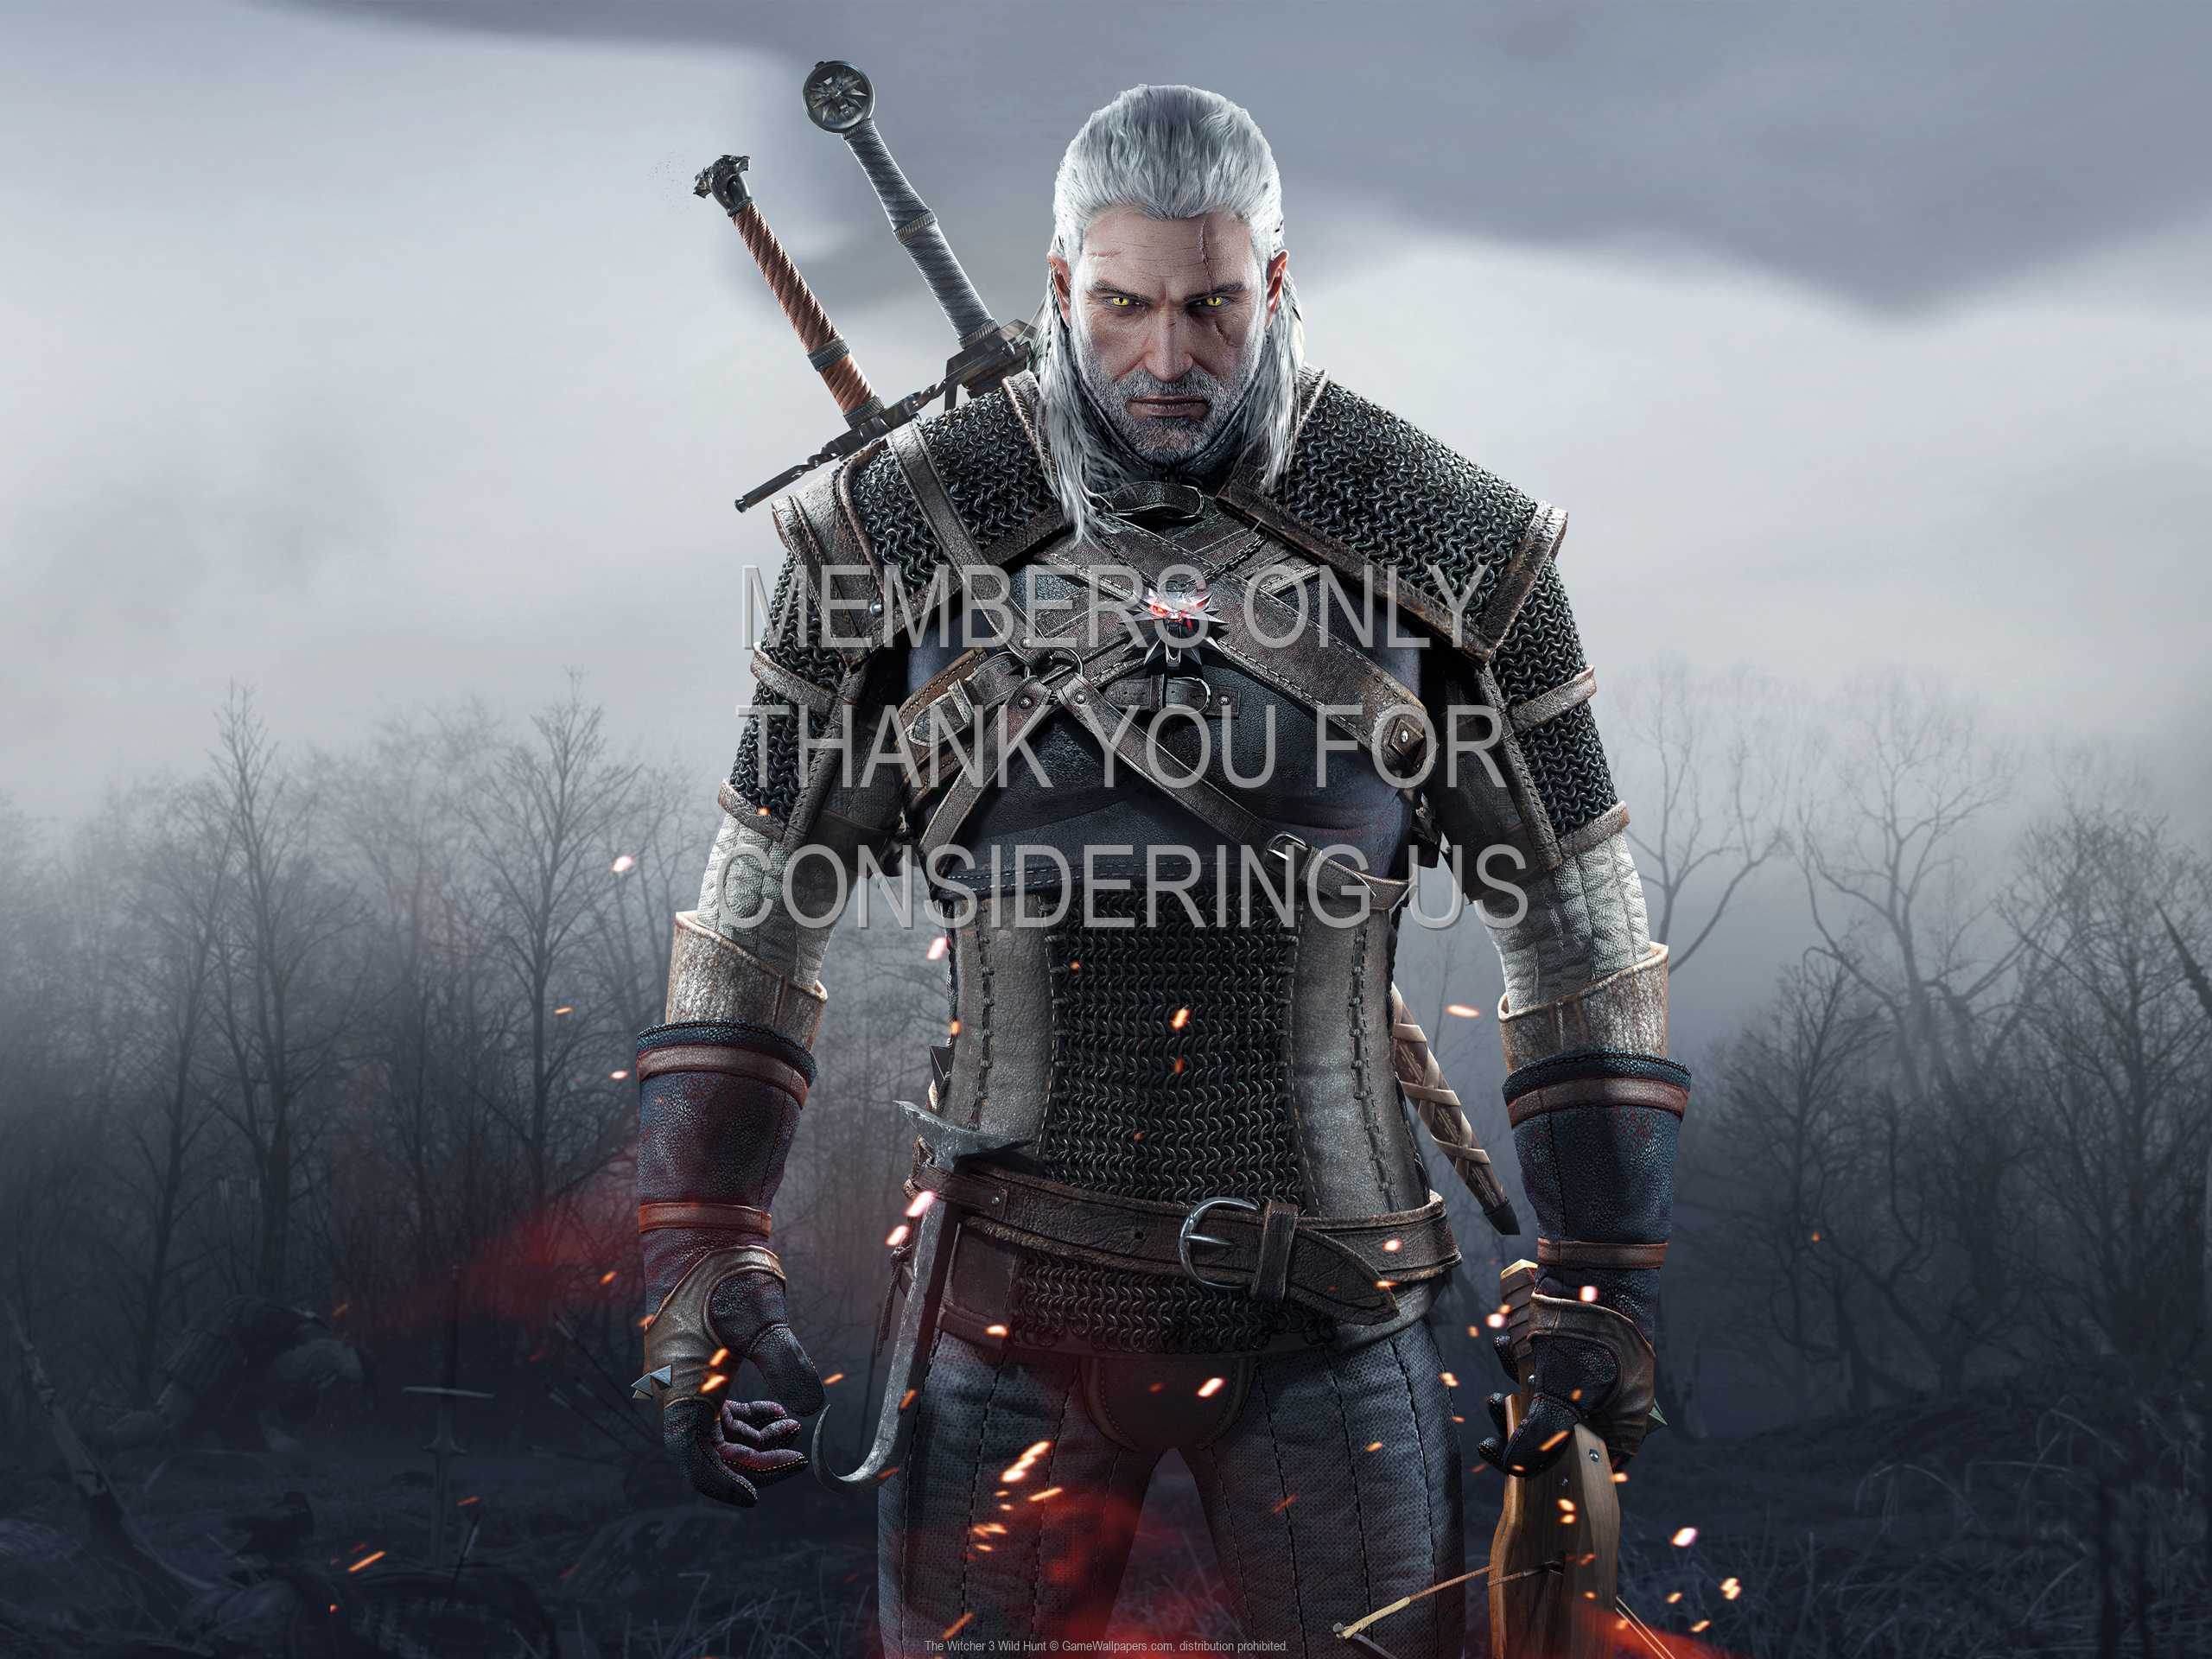 The Witcher 3: Wild Hunt 1080p Horizontal Handy Hintergrundbild 08